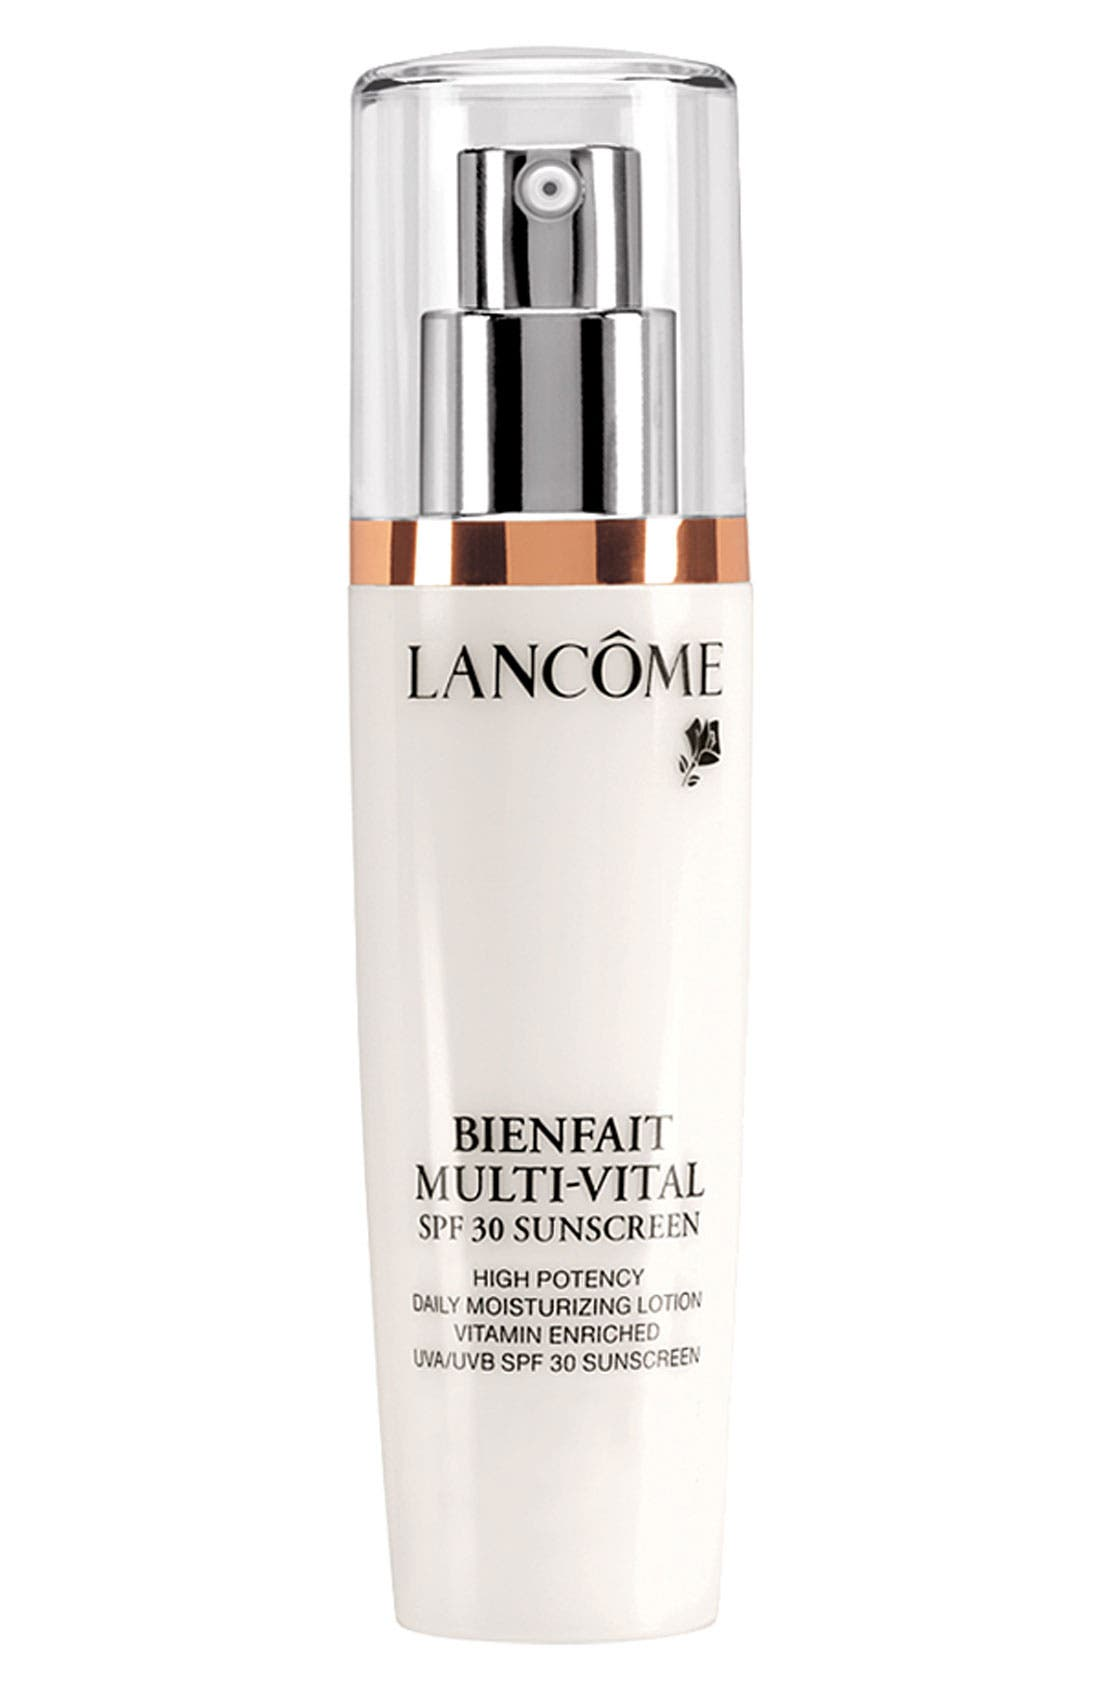 Lancôme Bienfait Multi-Vital SPF 30 Sunscreen